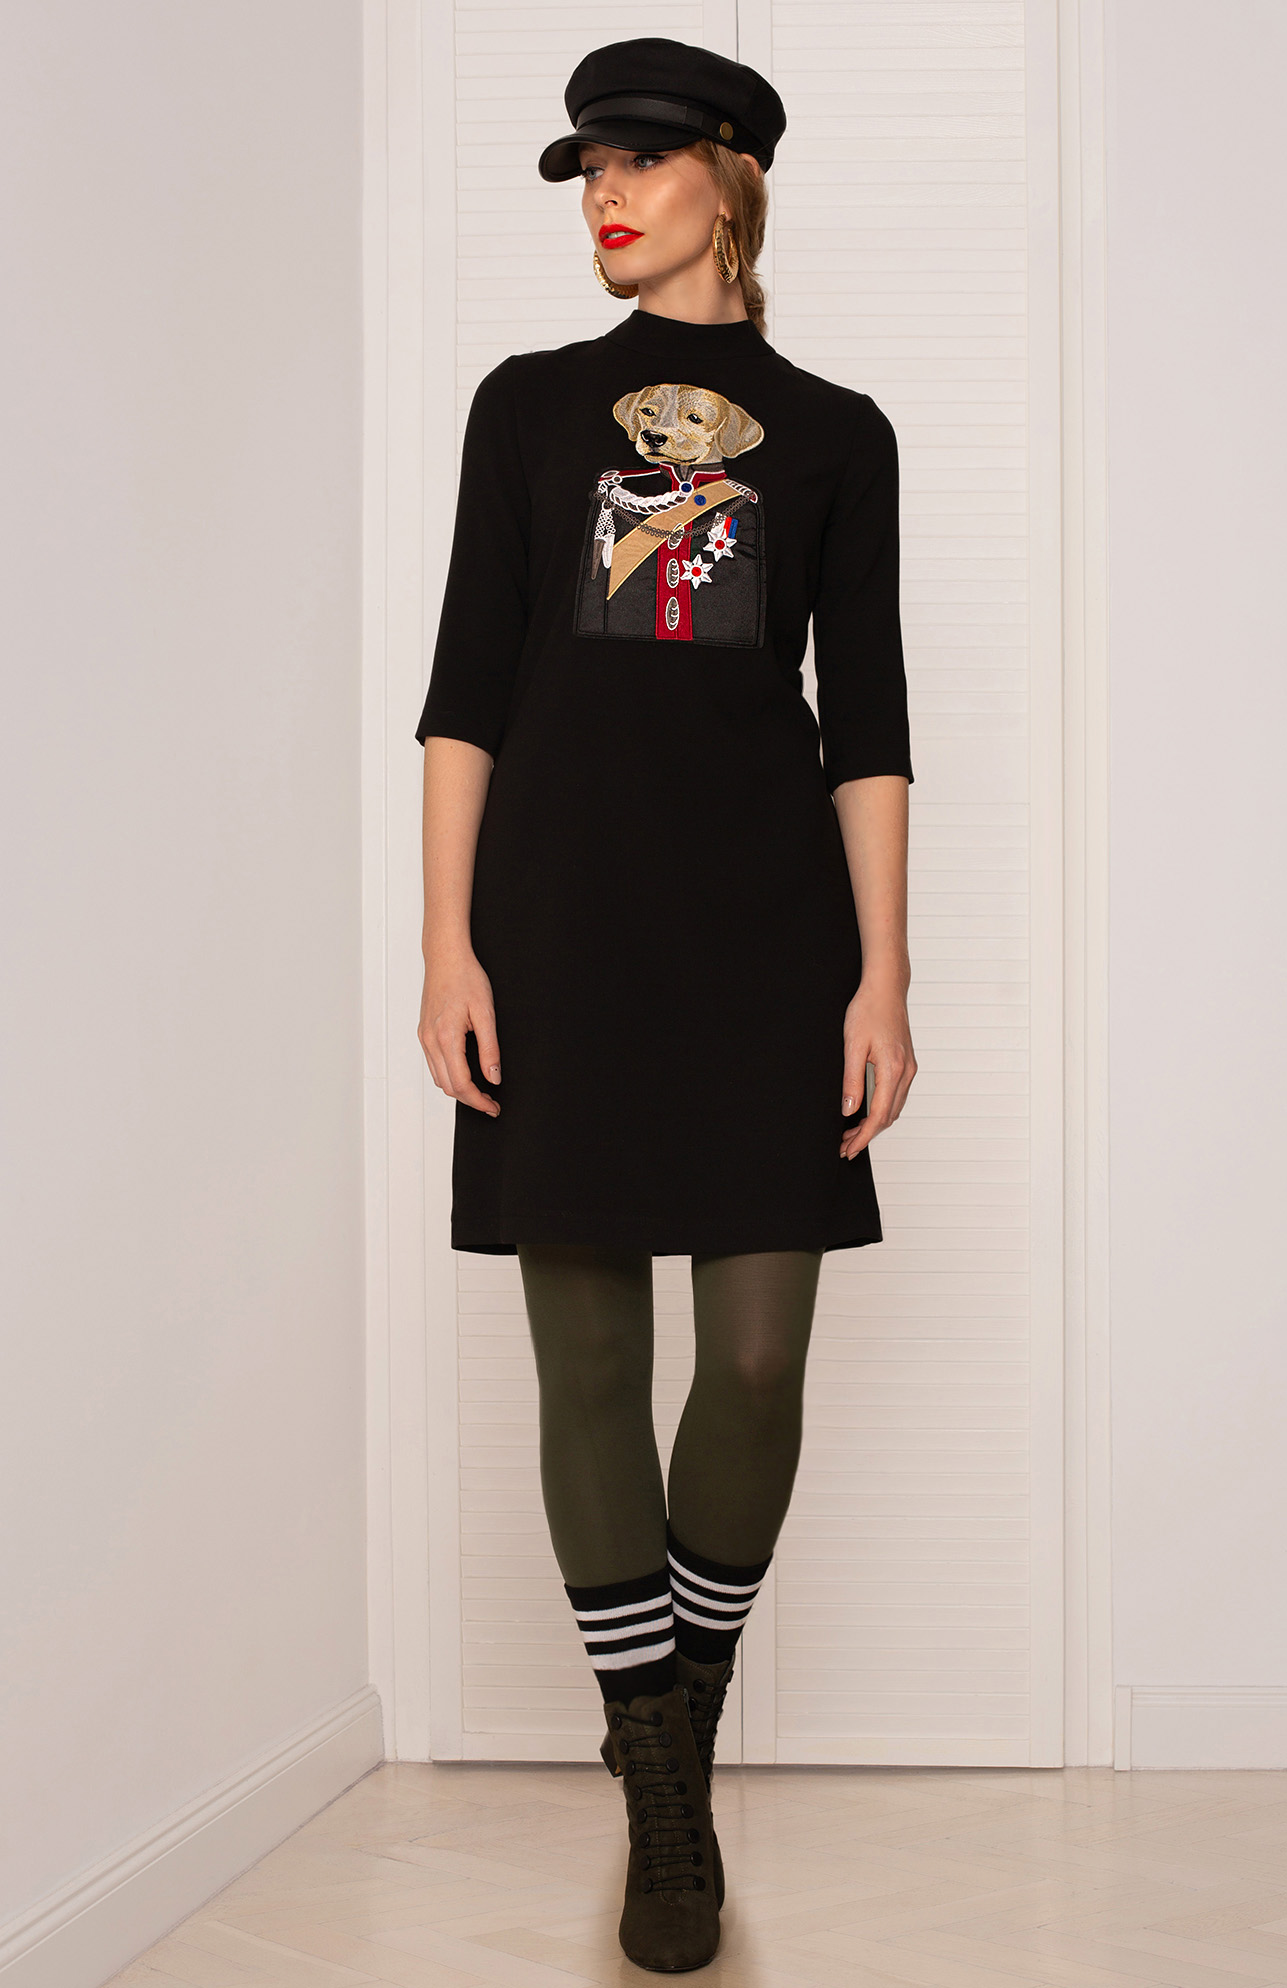 Sukienka z psem - Kasia Miciak design